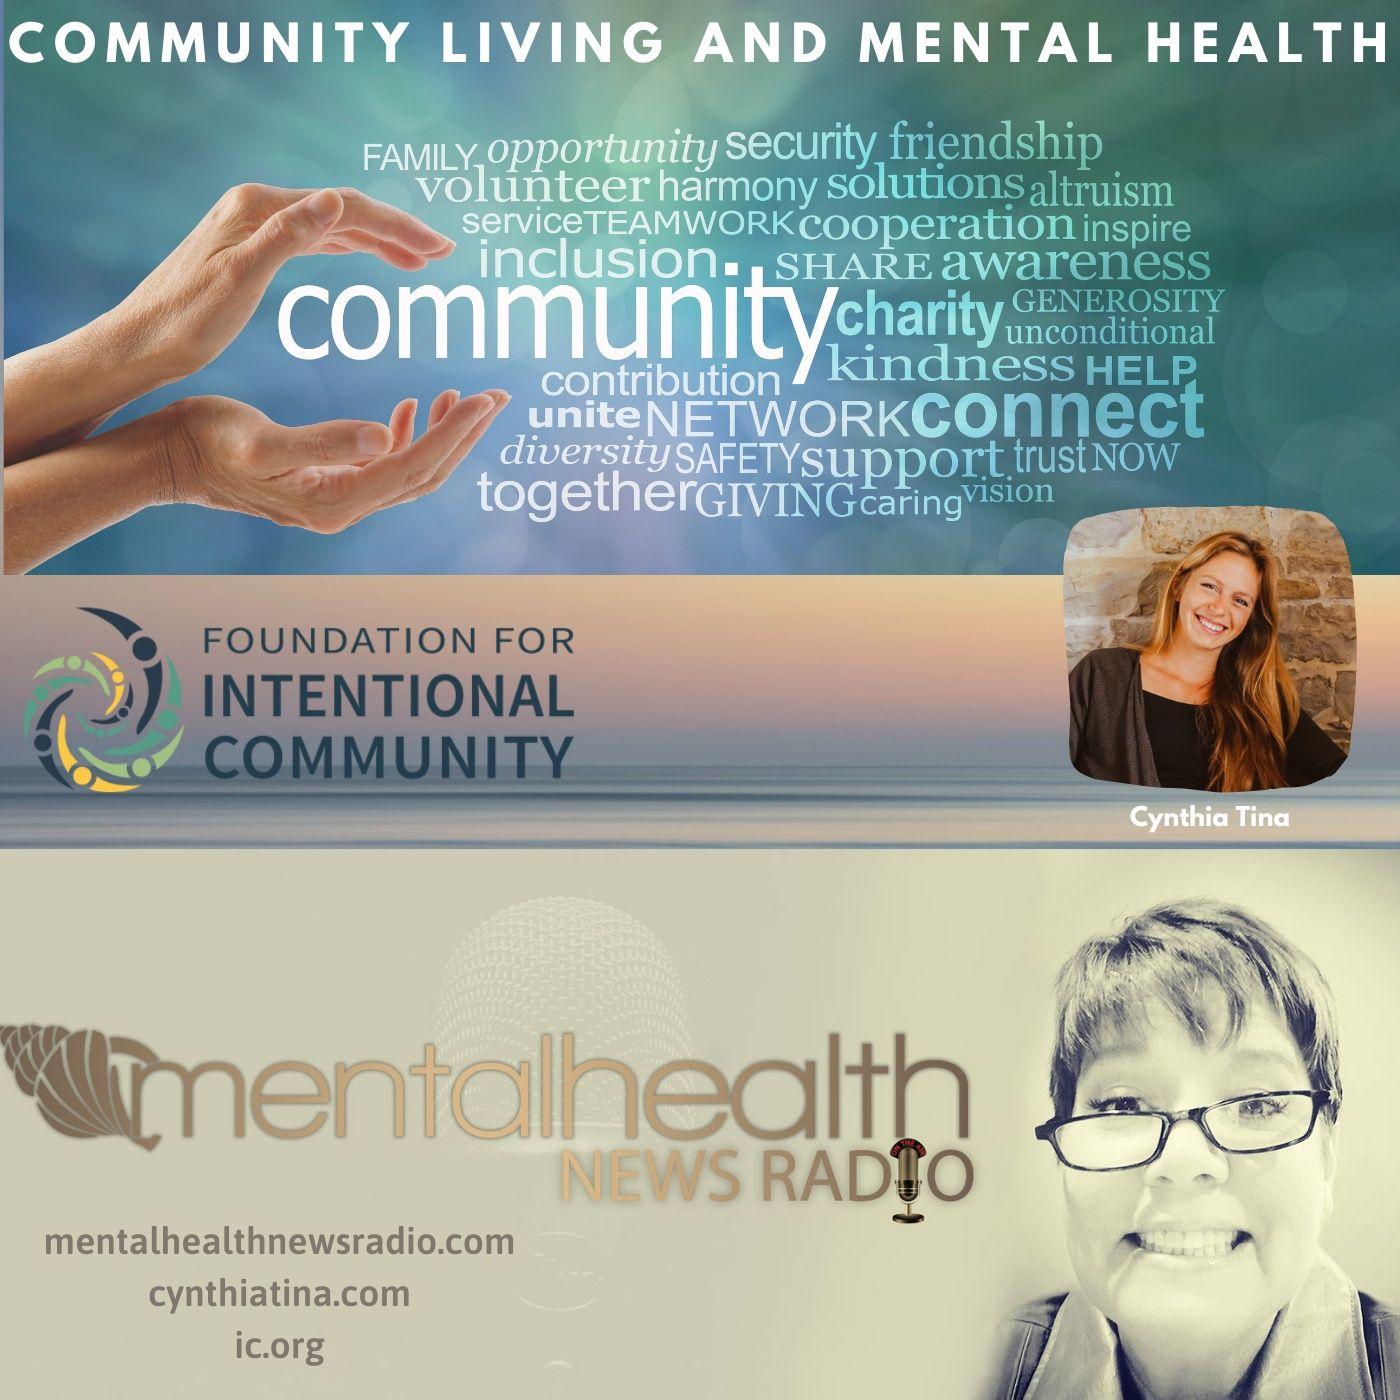 Mental Health News Radio - Community Living and Mental Health